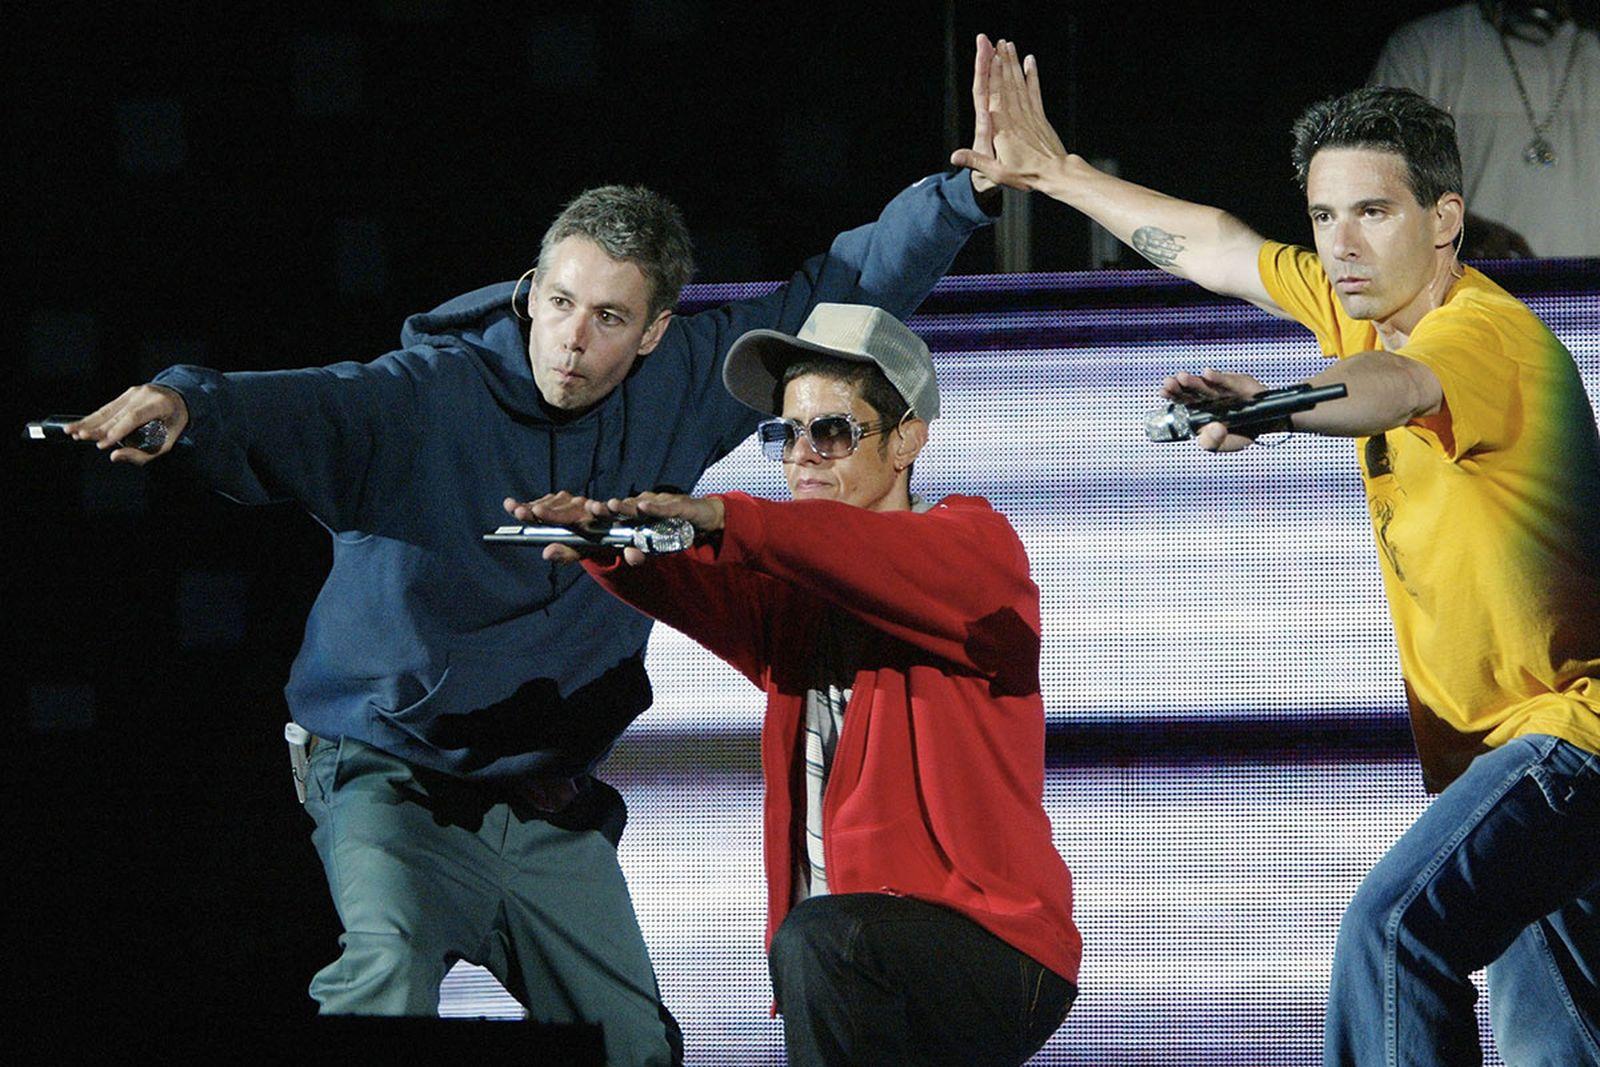 beastie boys skate culture ben davis carhartt